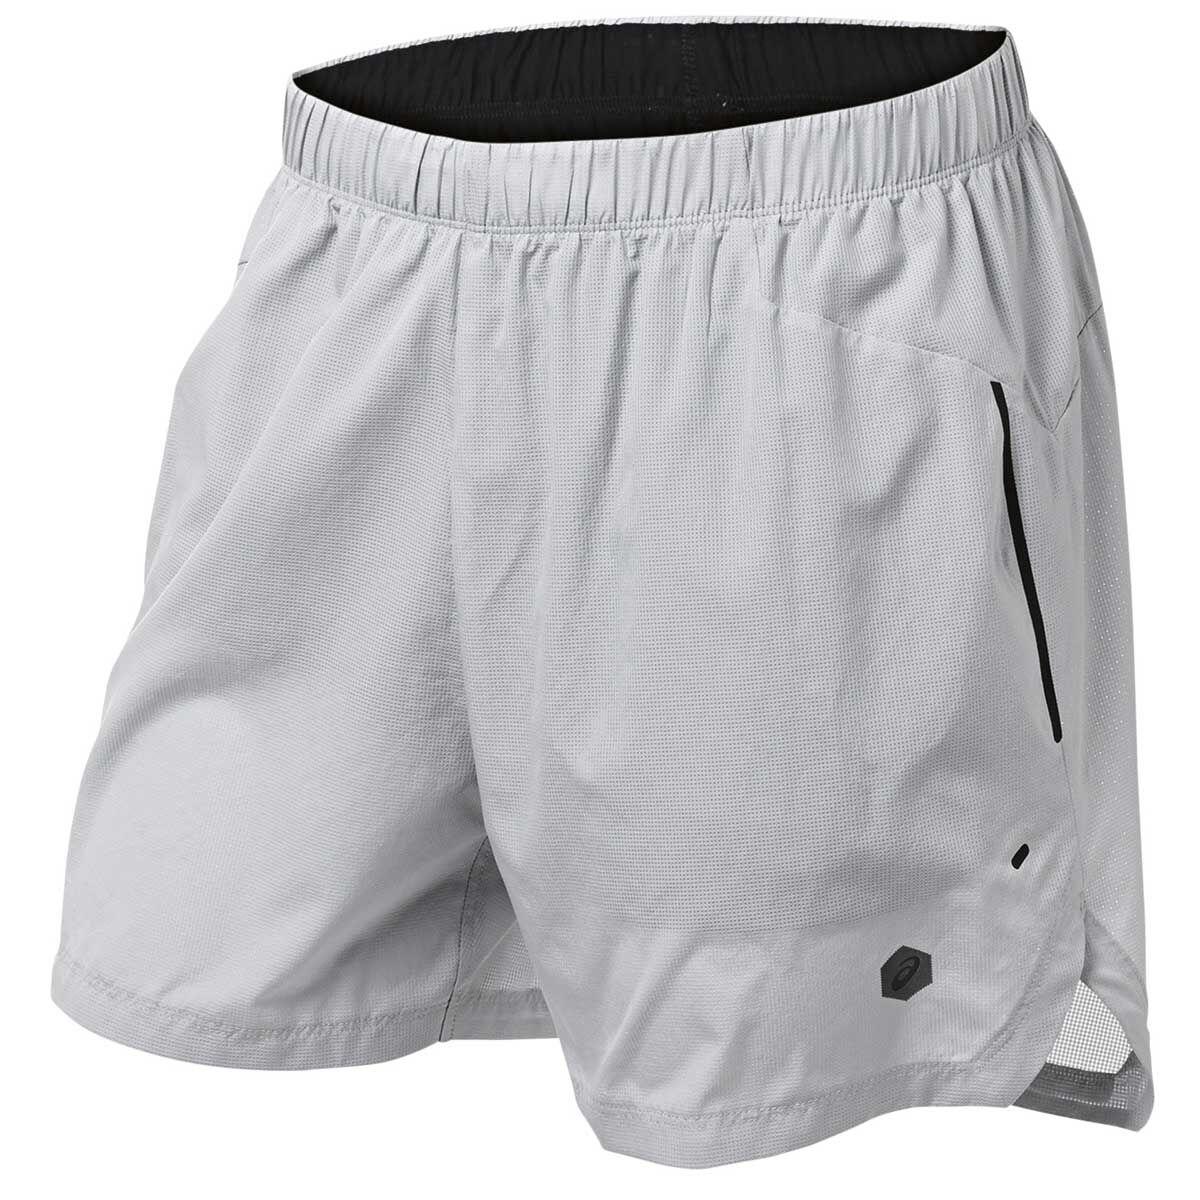 asics mens 2 in 1 shorts